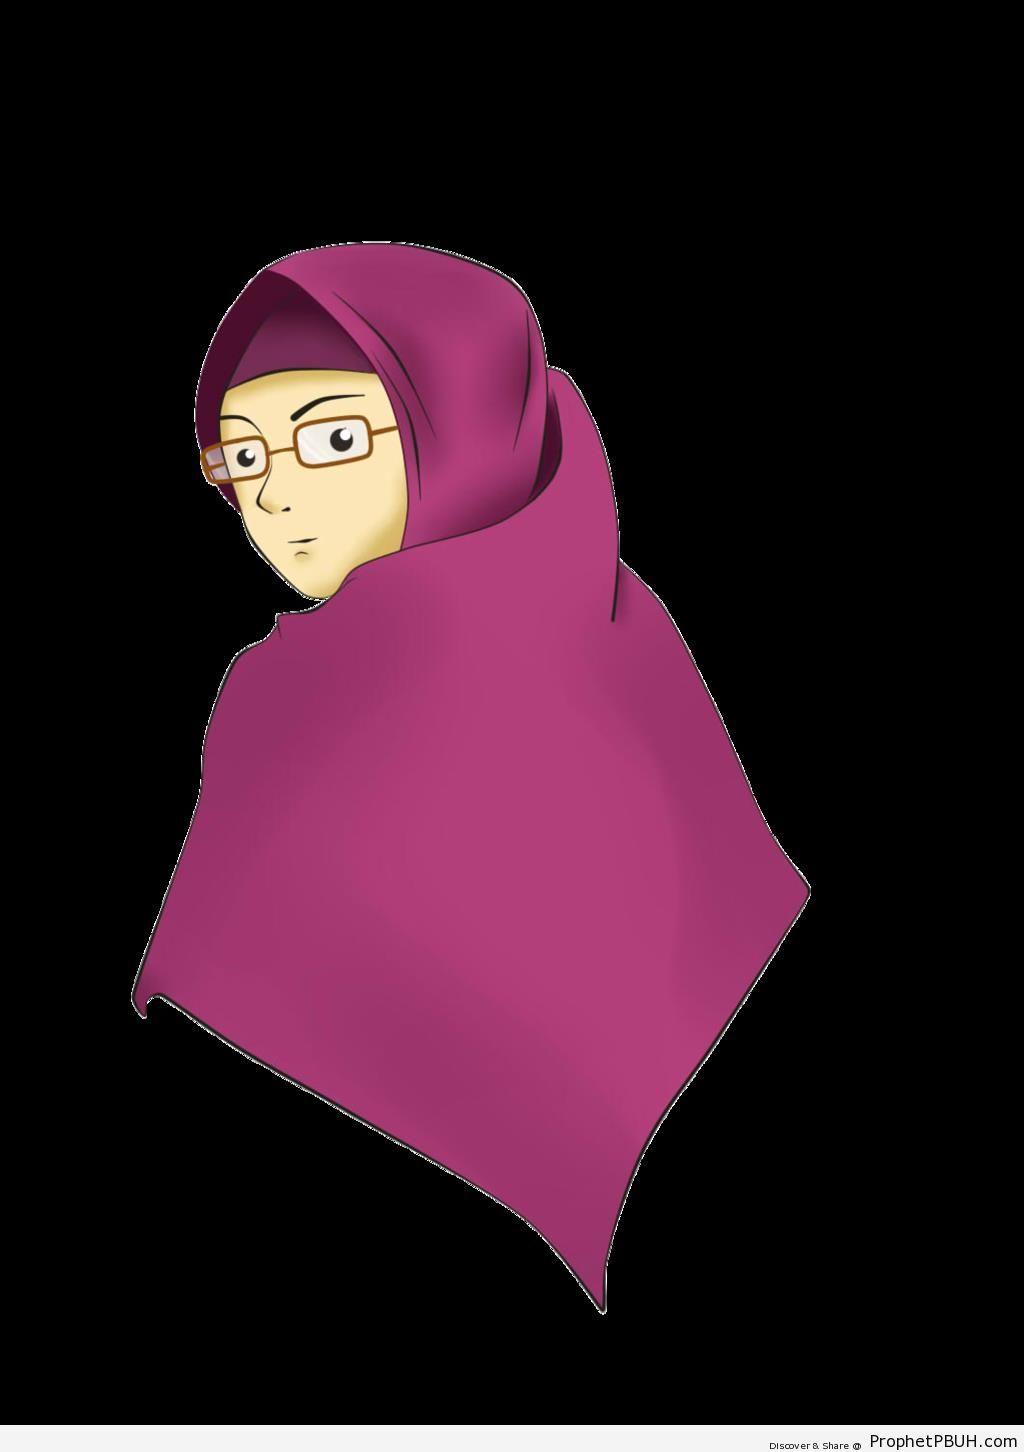 Muslimah Wearing Purple Hijab and Glasses - Drawings